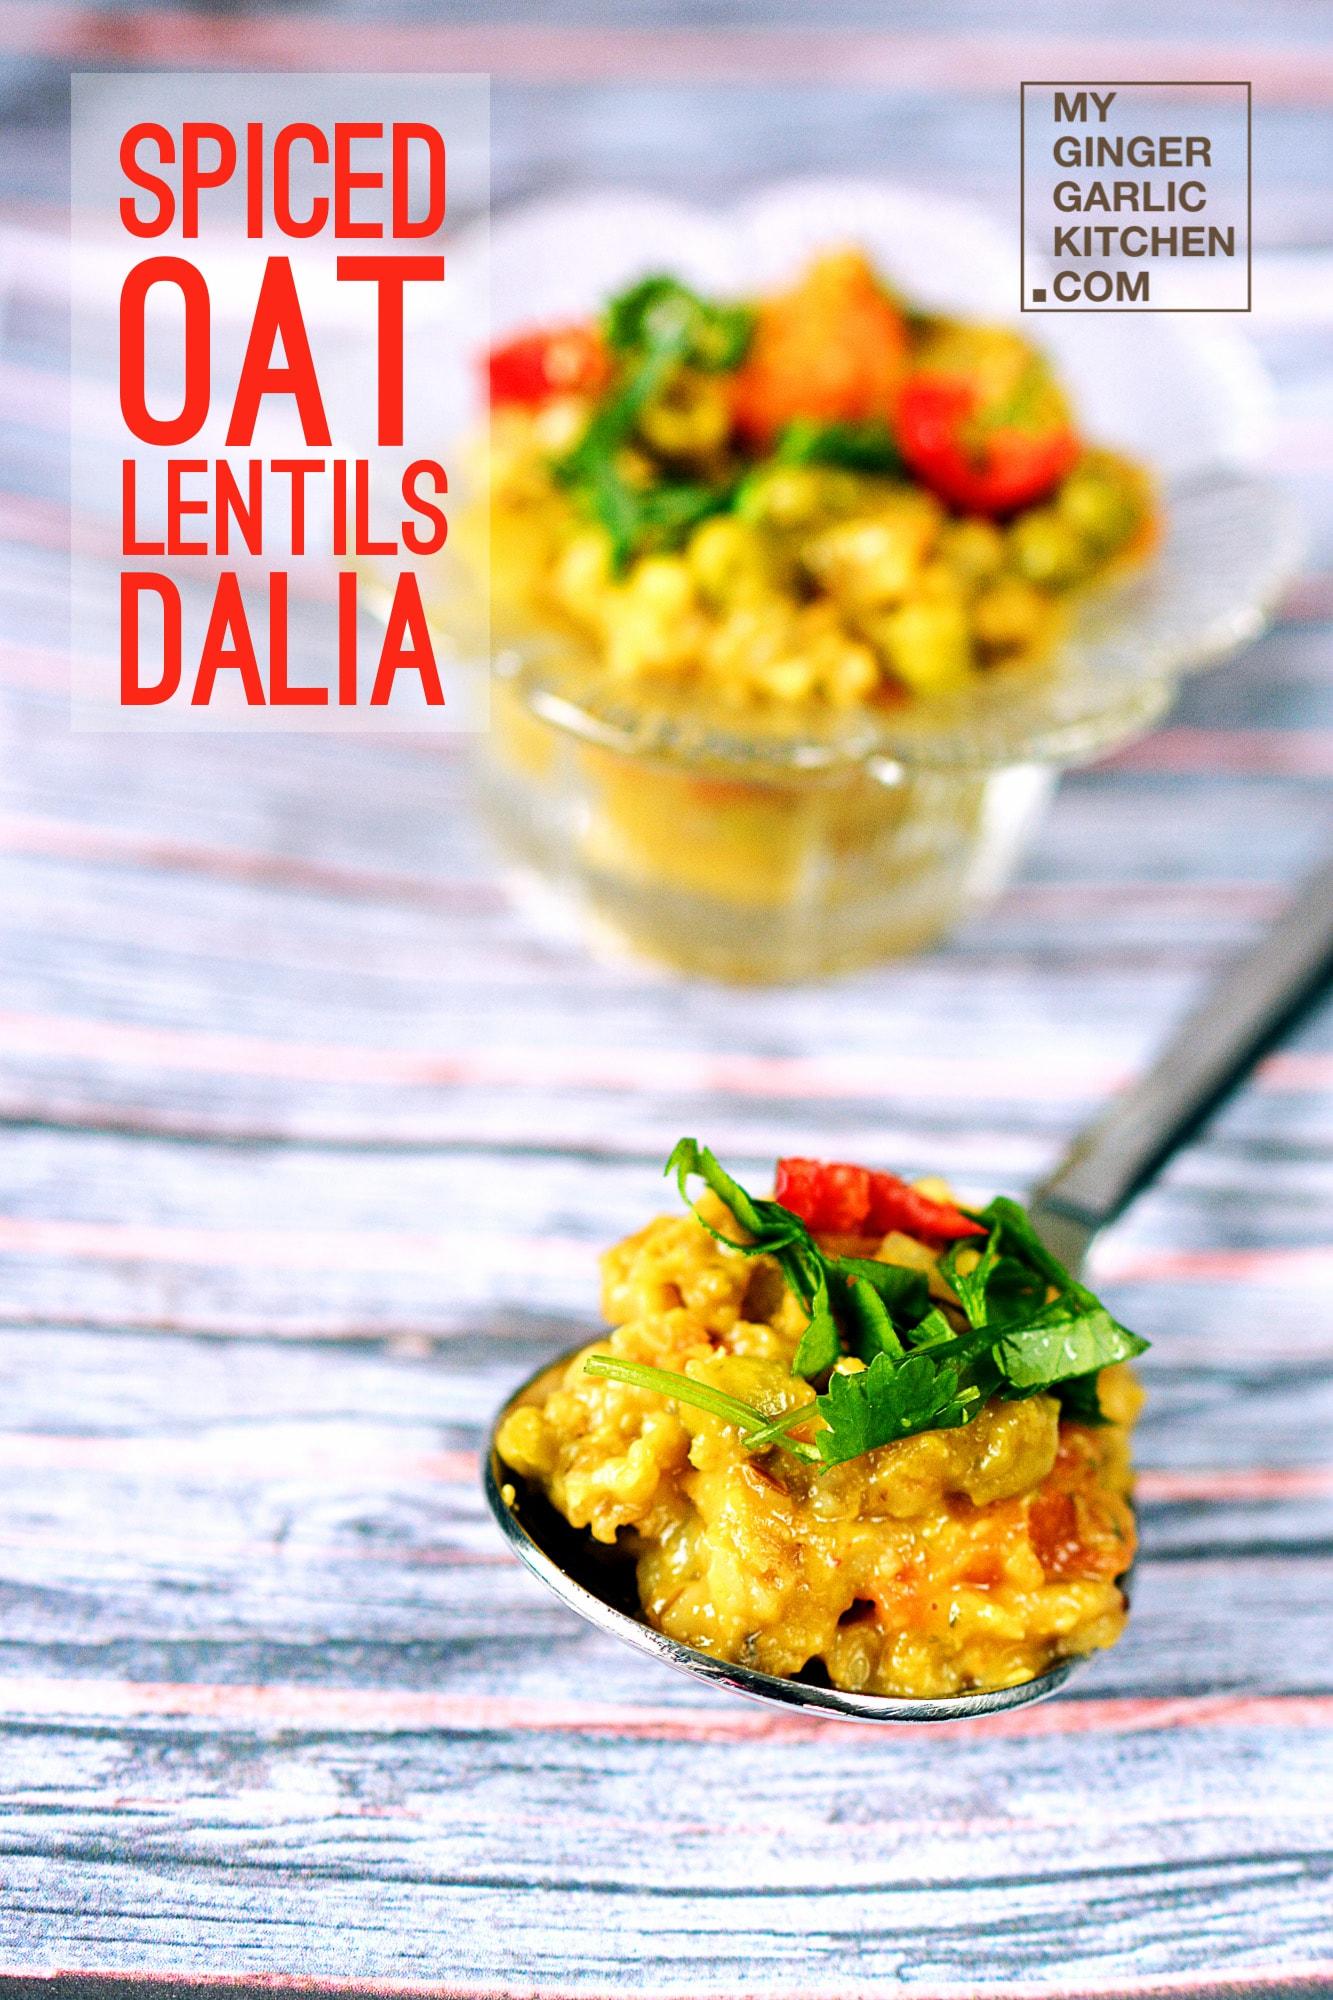 Image of Spiced Oat Lentils Dalia - Savory Oats Porridge